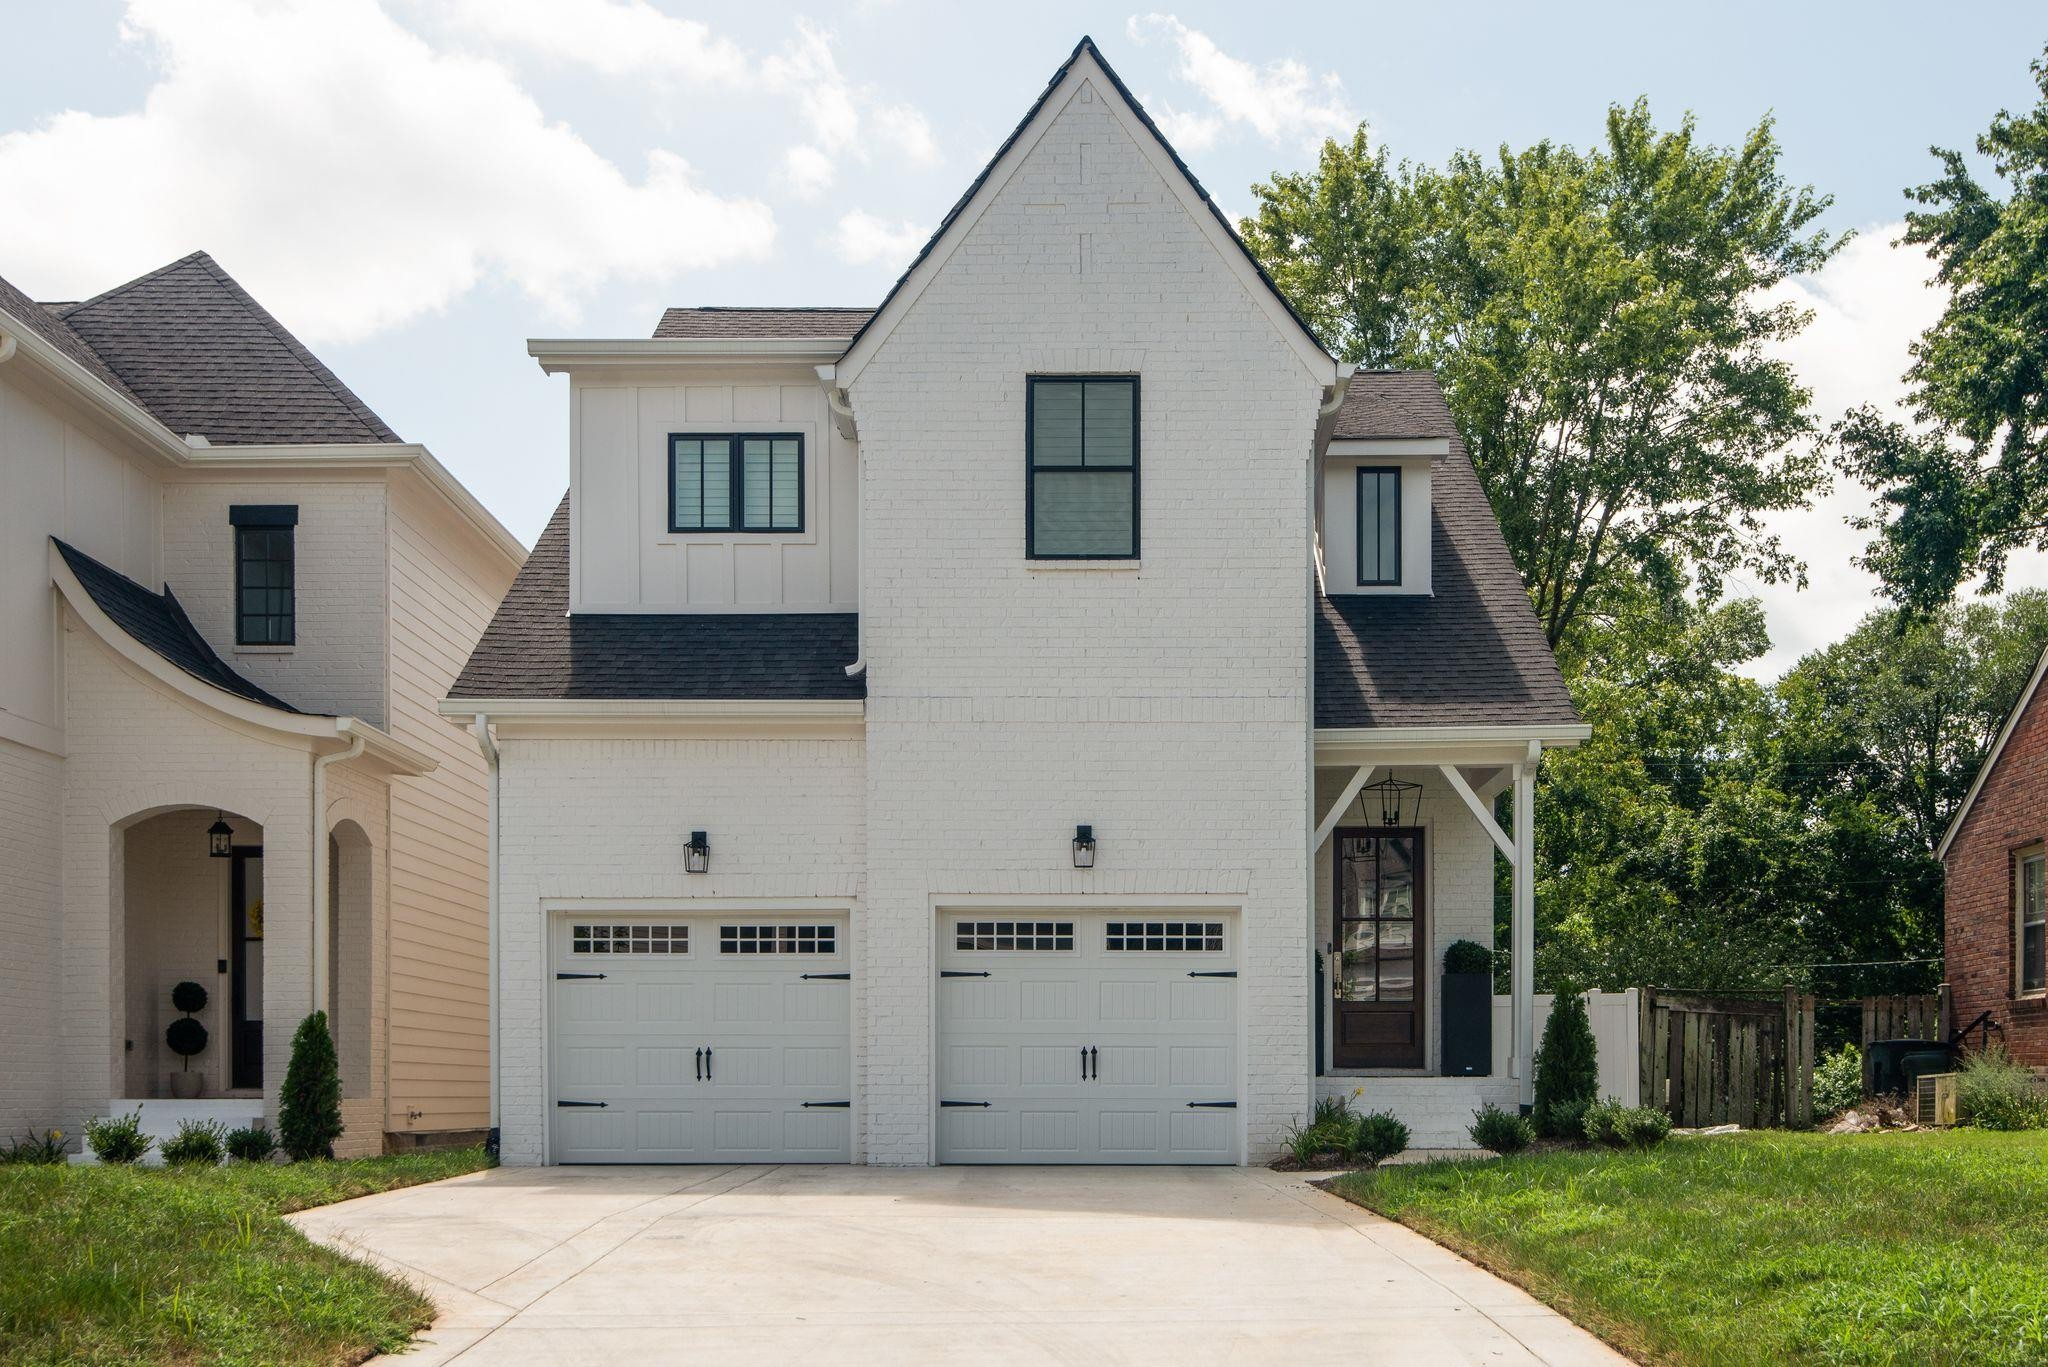 519B Camden Dr, Nashville, TN 37211 - Nashville, TN real estate listing